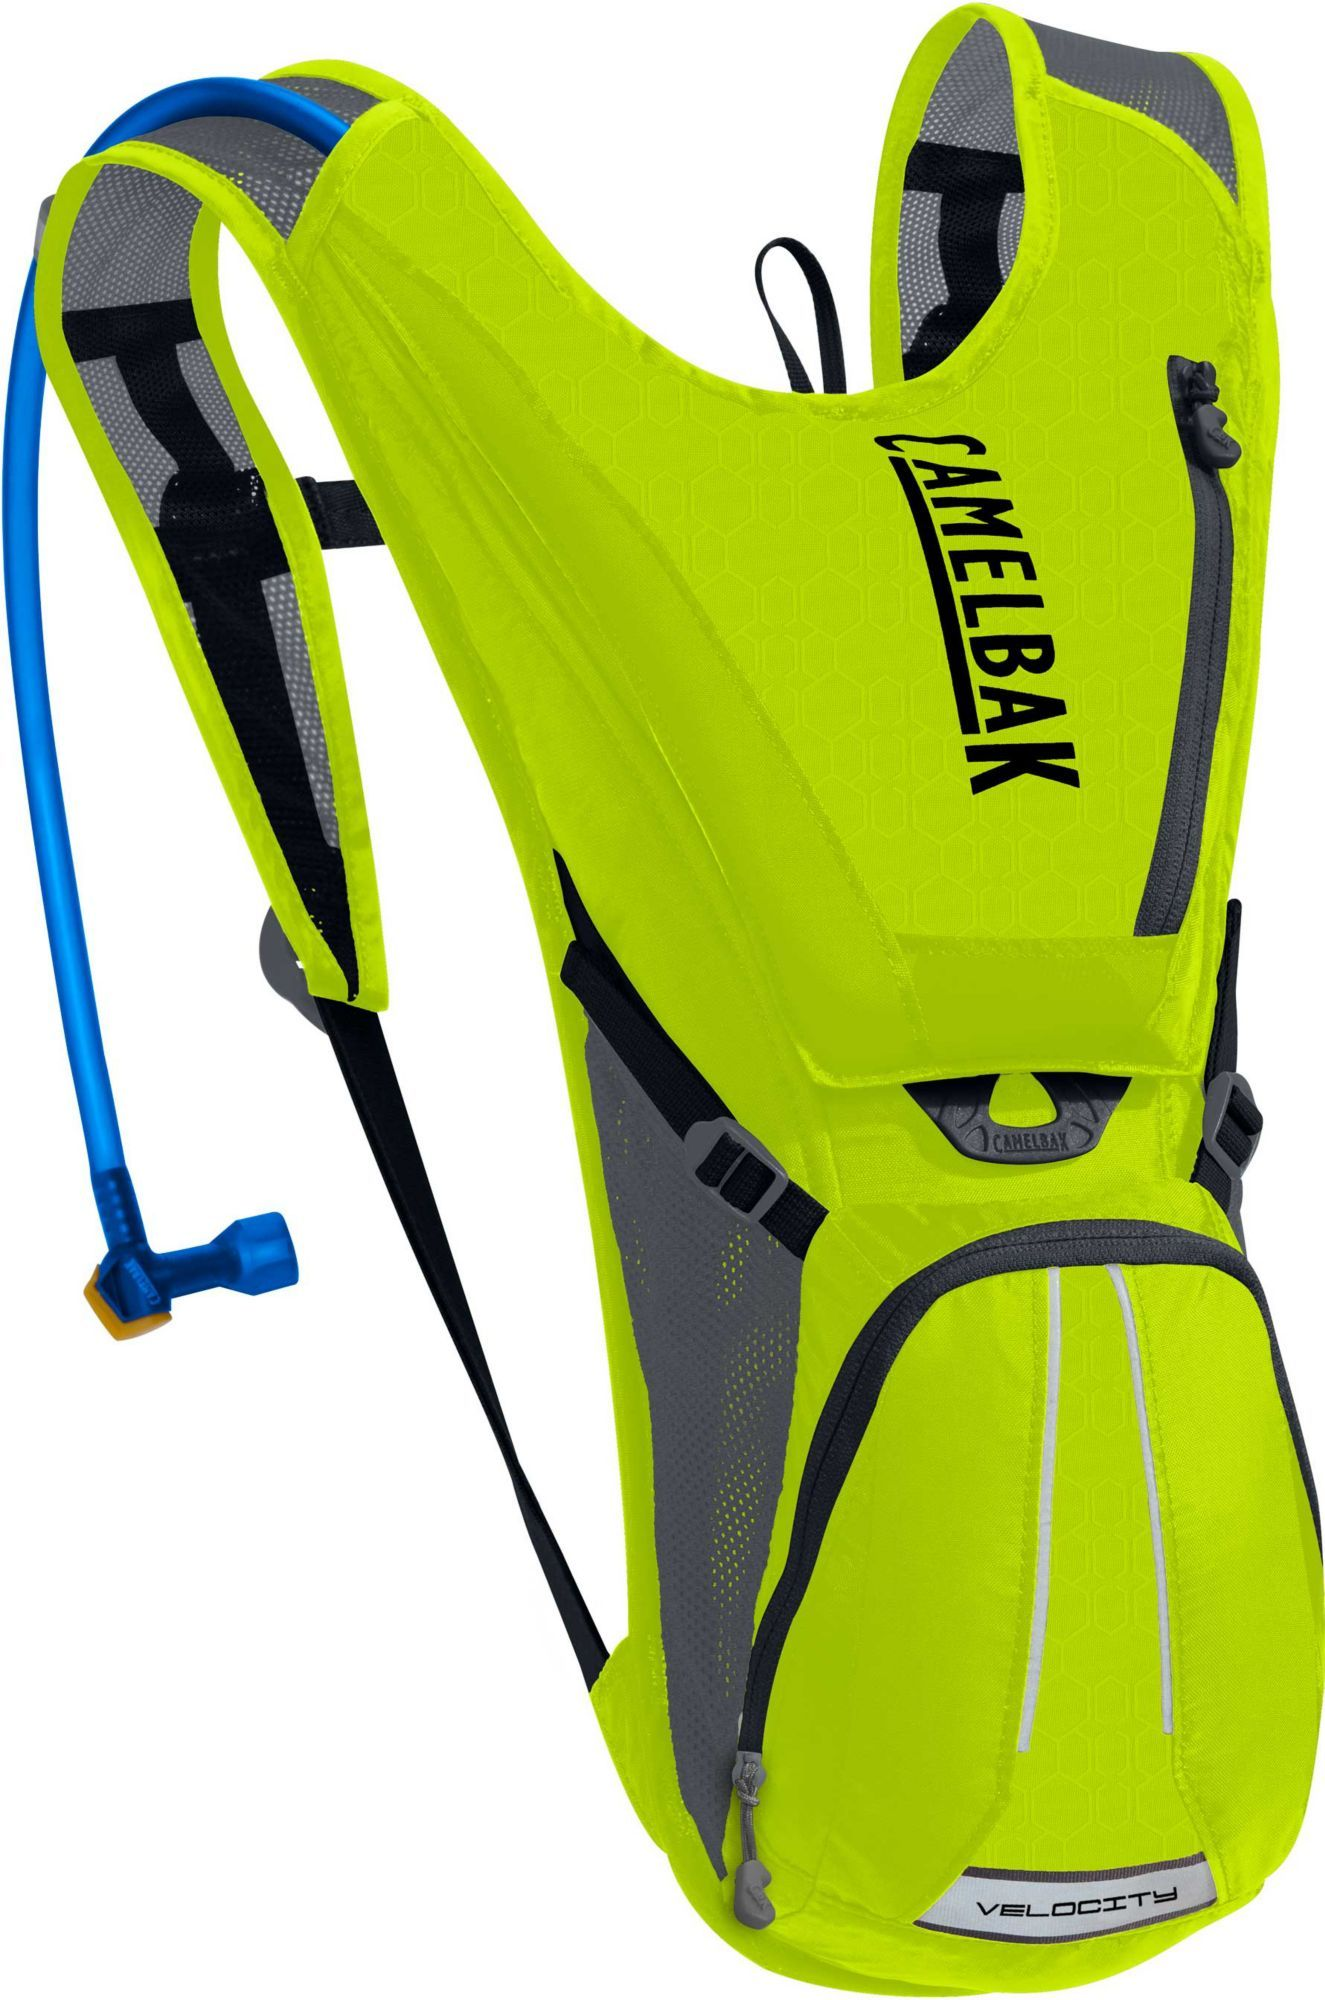 CamelBak Velocity 70 oz. Hydration Pack in 2020